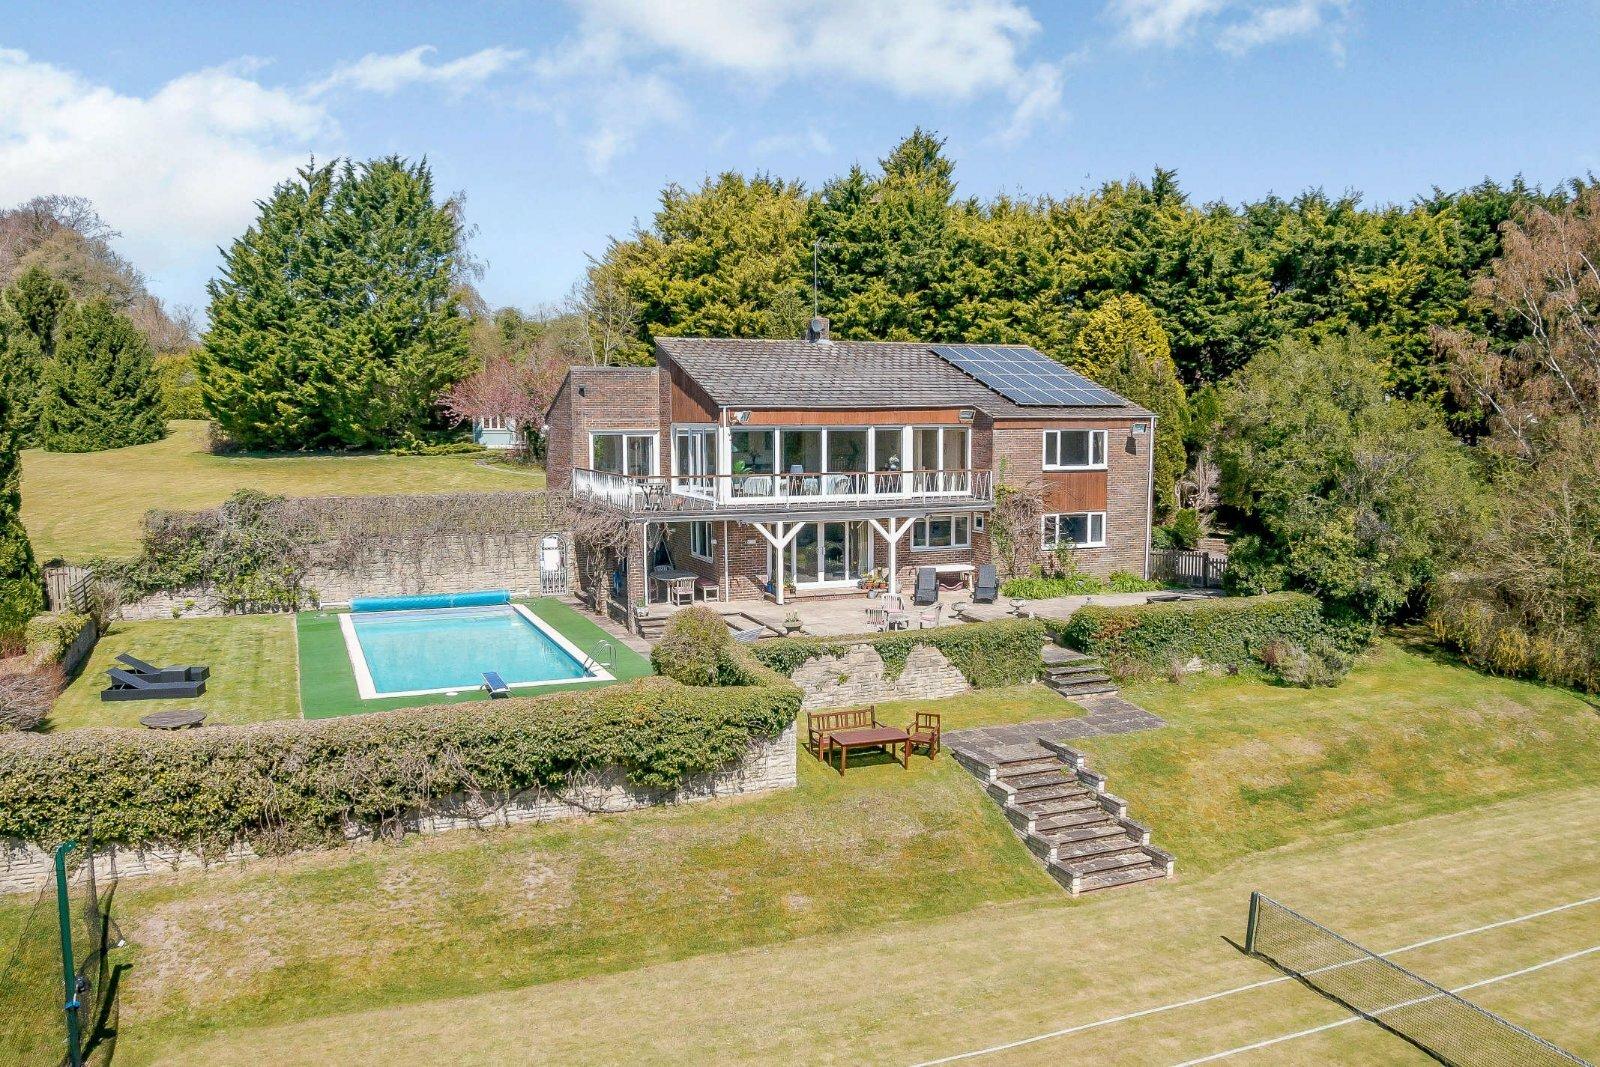 House in Hurstbourne Tarrant, England, United Kingdom 1